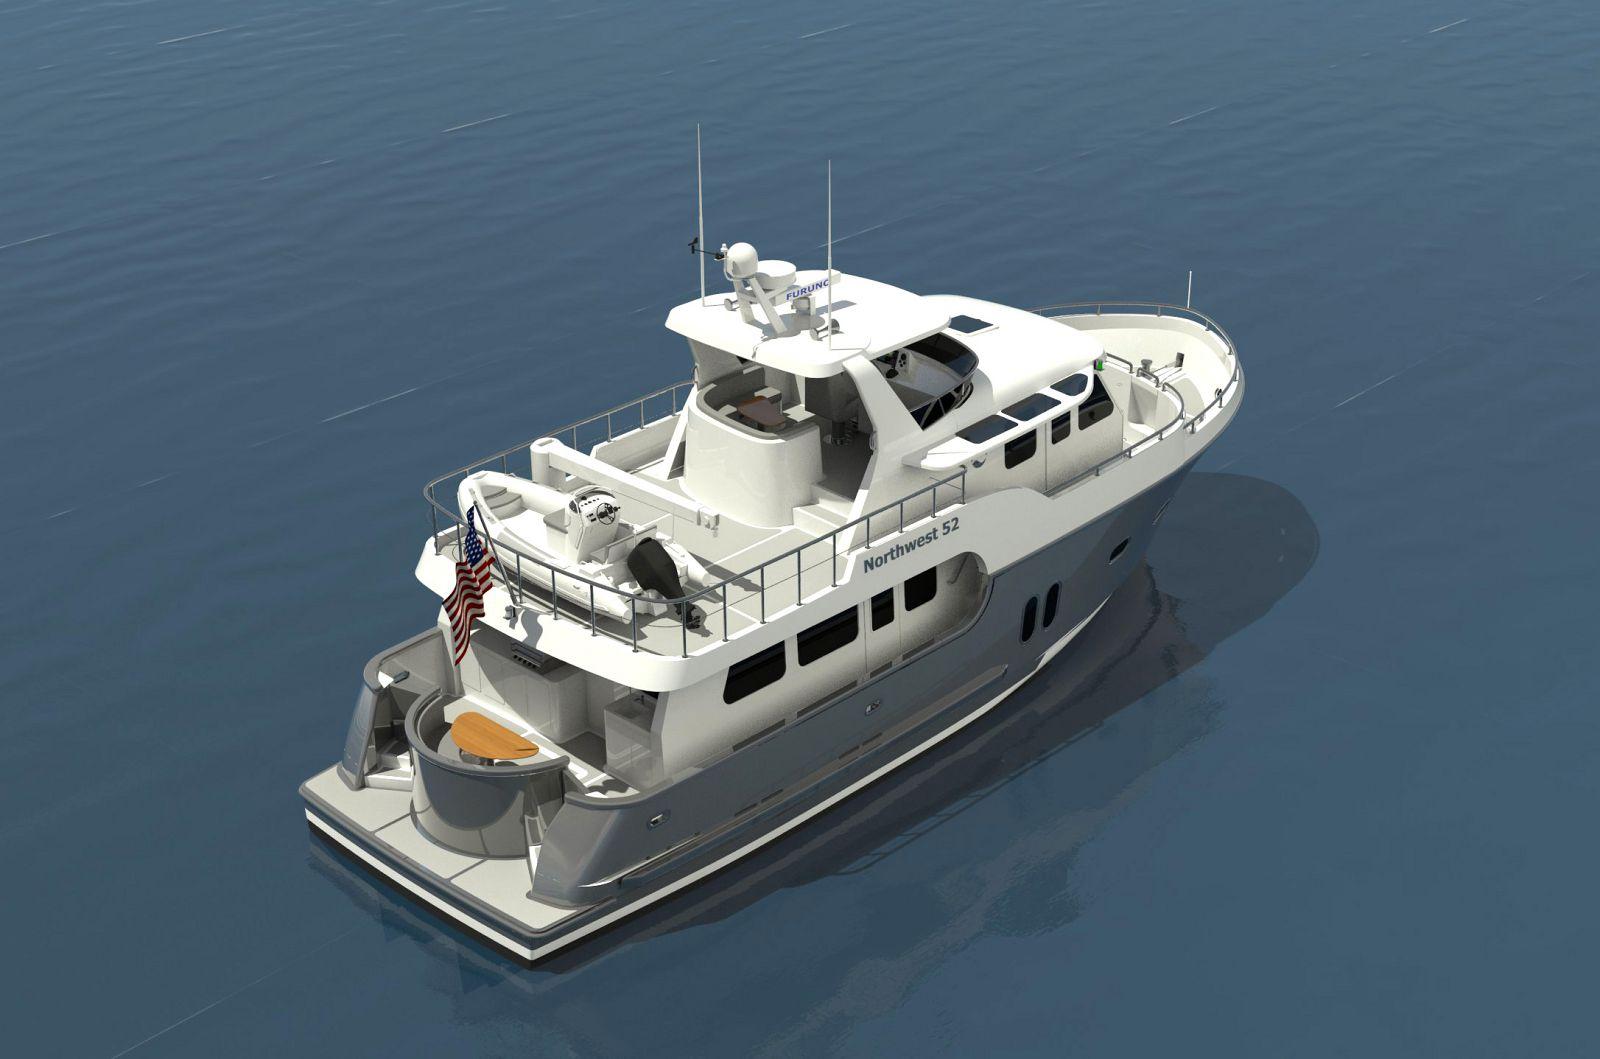 Northwest-Yachts 52-Trawler-Birdseye-View